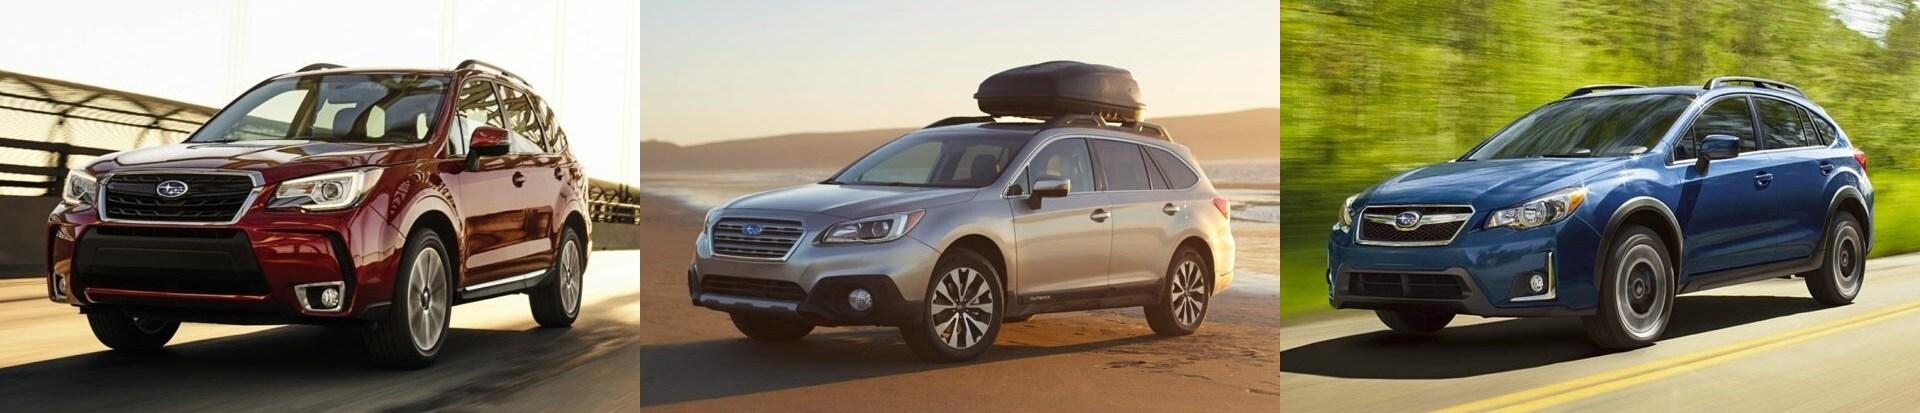 Compare The Subaru Suv Lineup Subaru Forester Subaru Outback